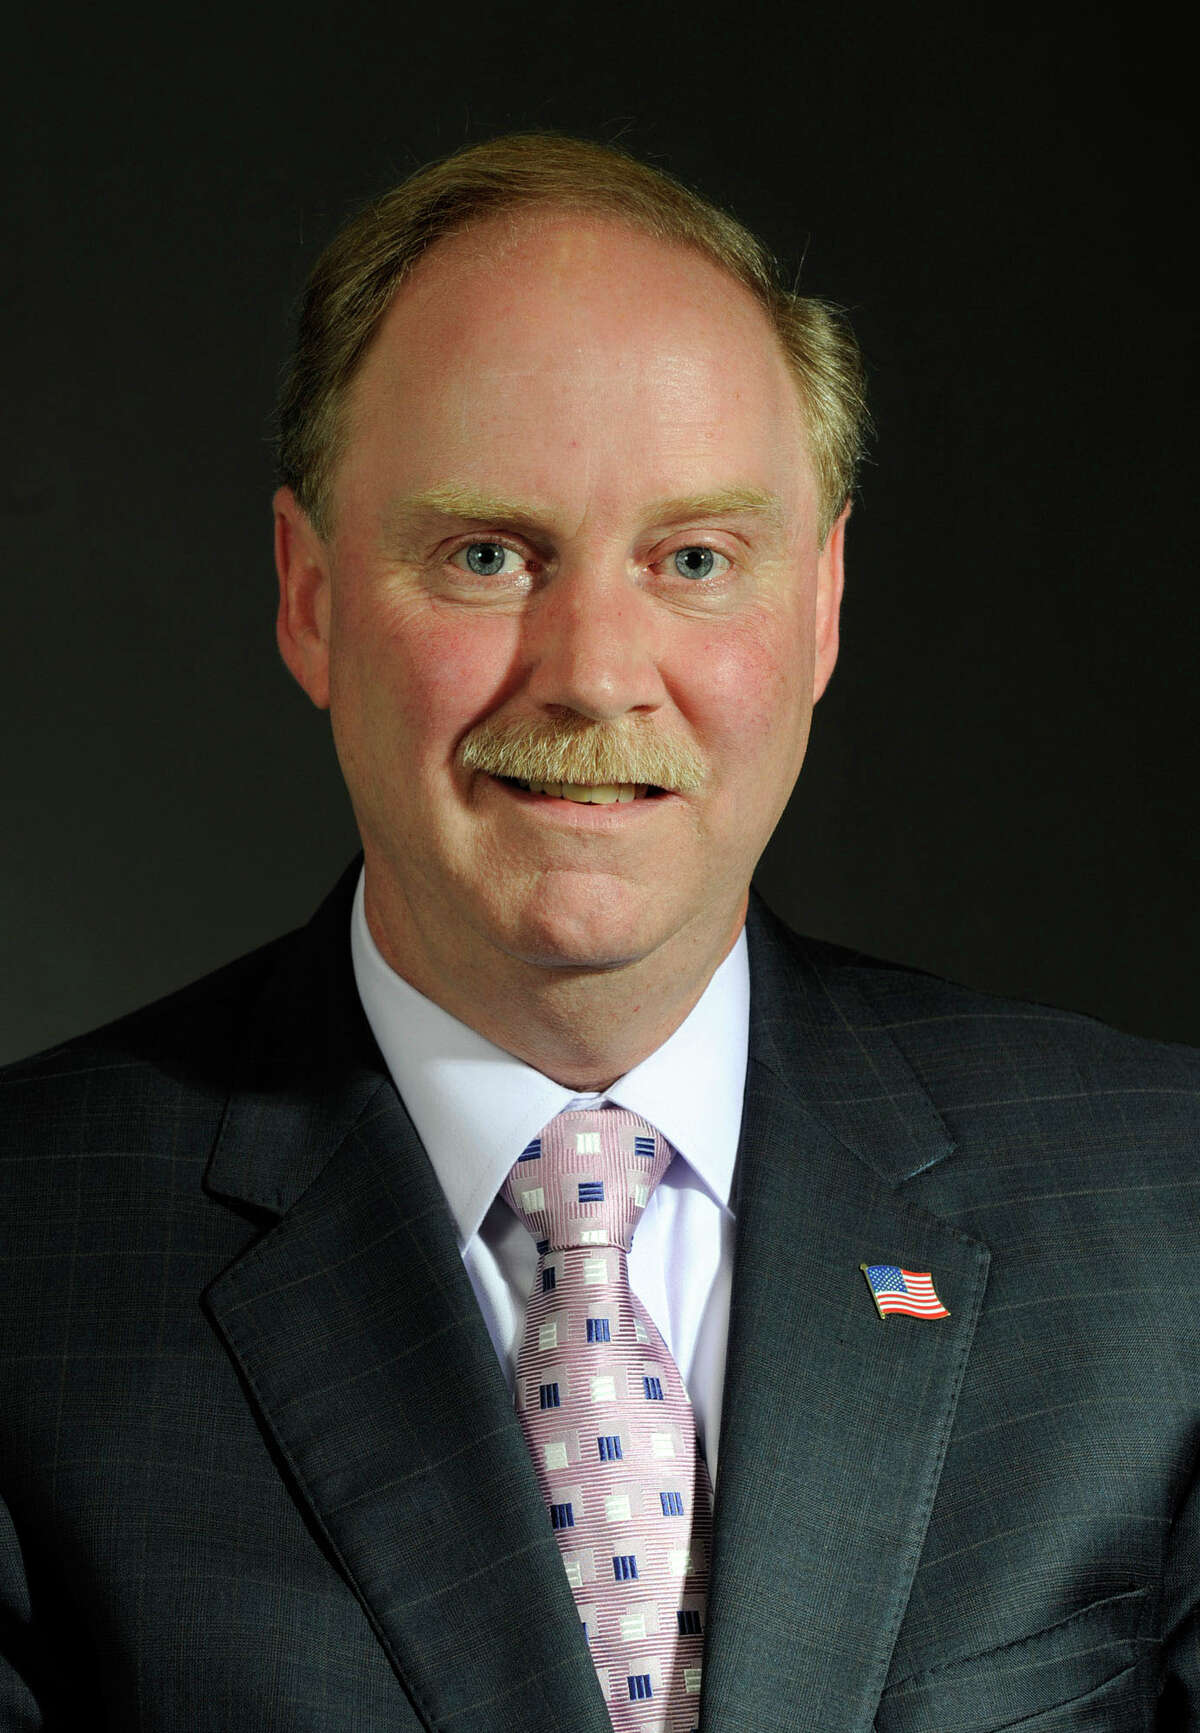 State Sen. Michael McLachlan